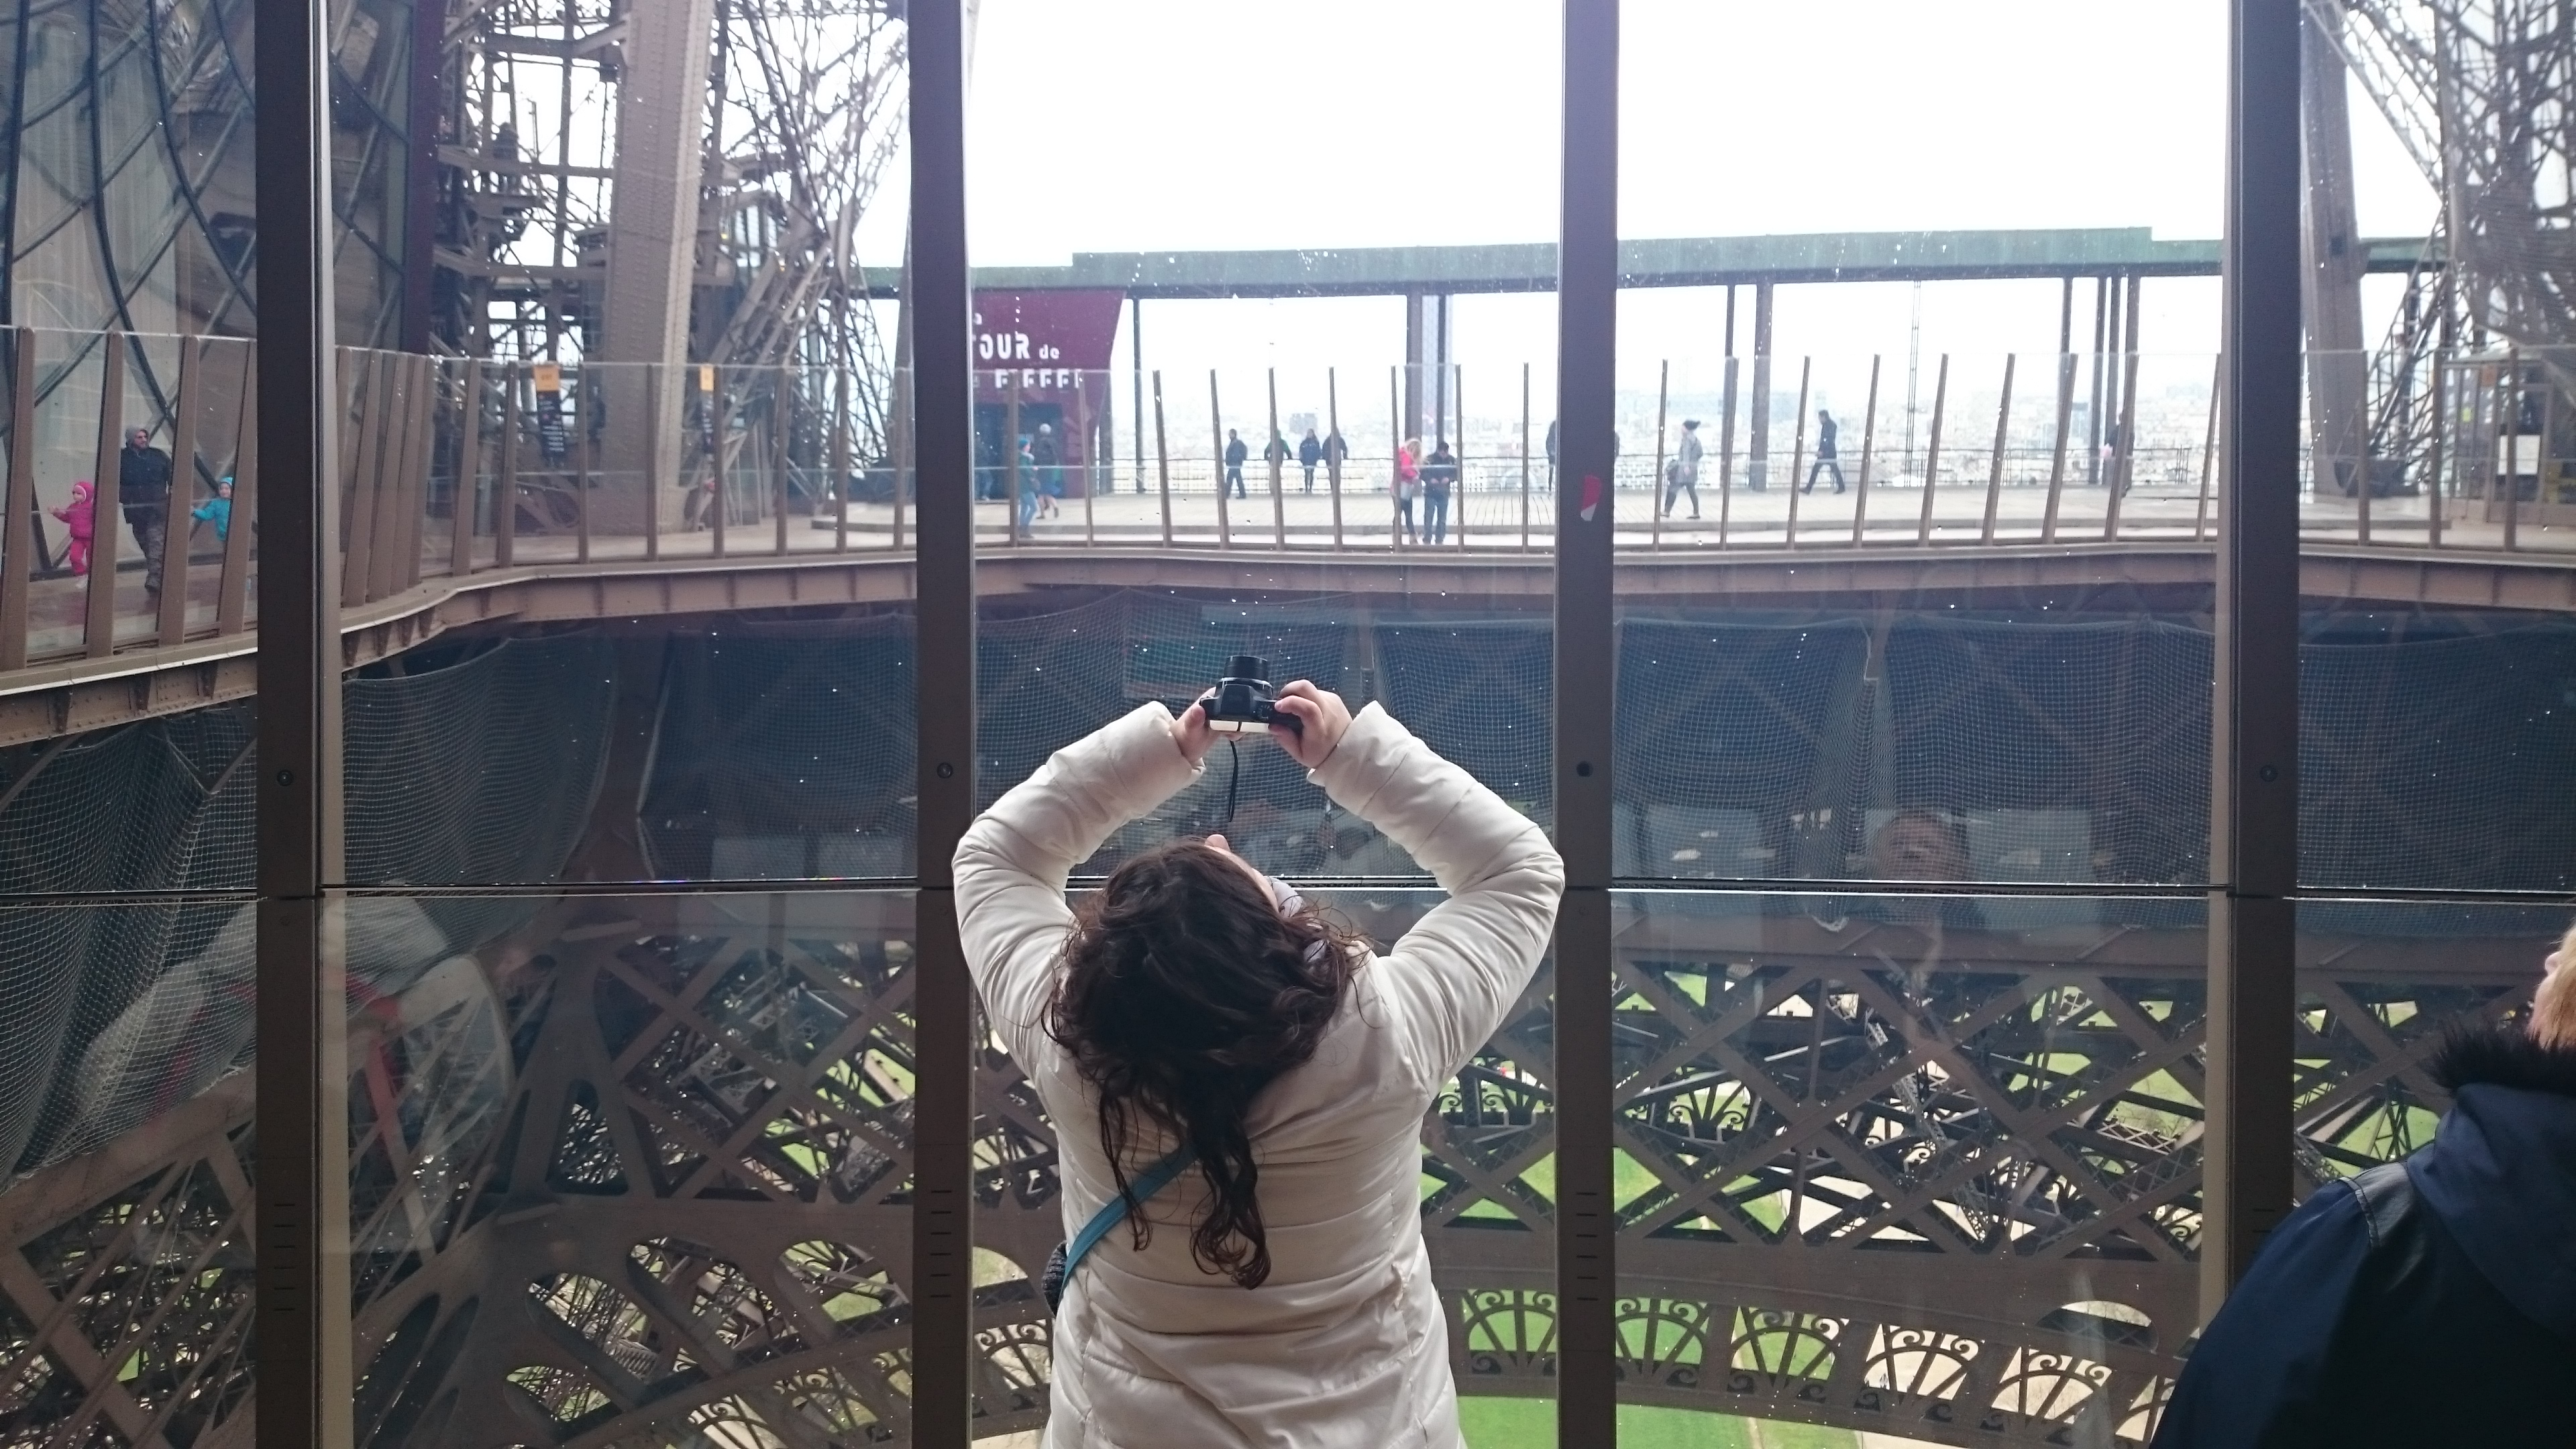 DSC 1959 - Visitando la Torre Eiffel en Paris